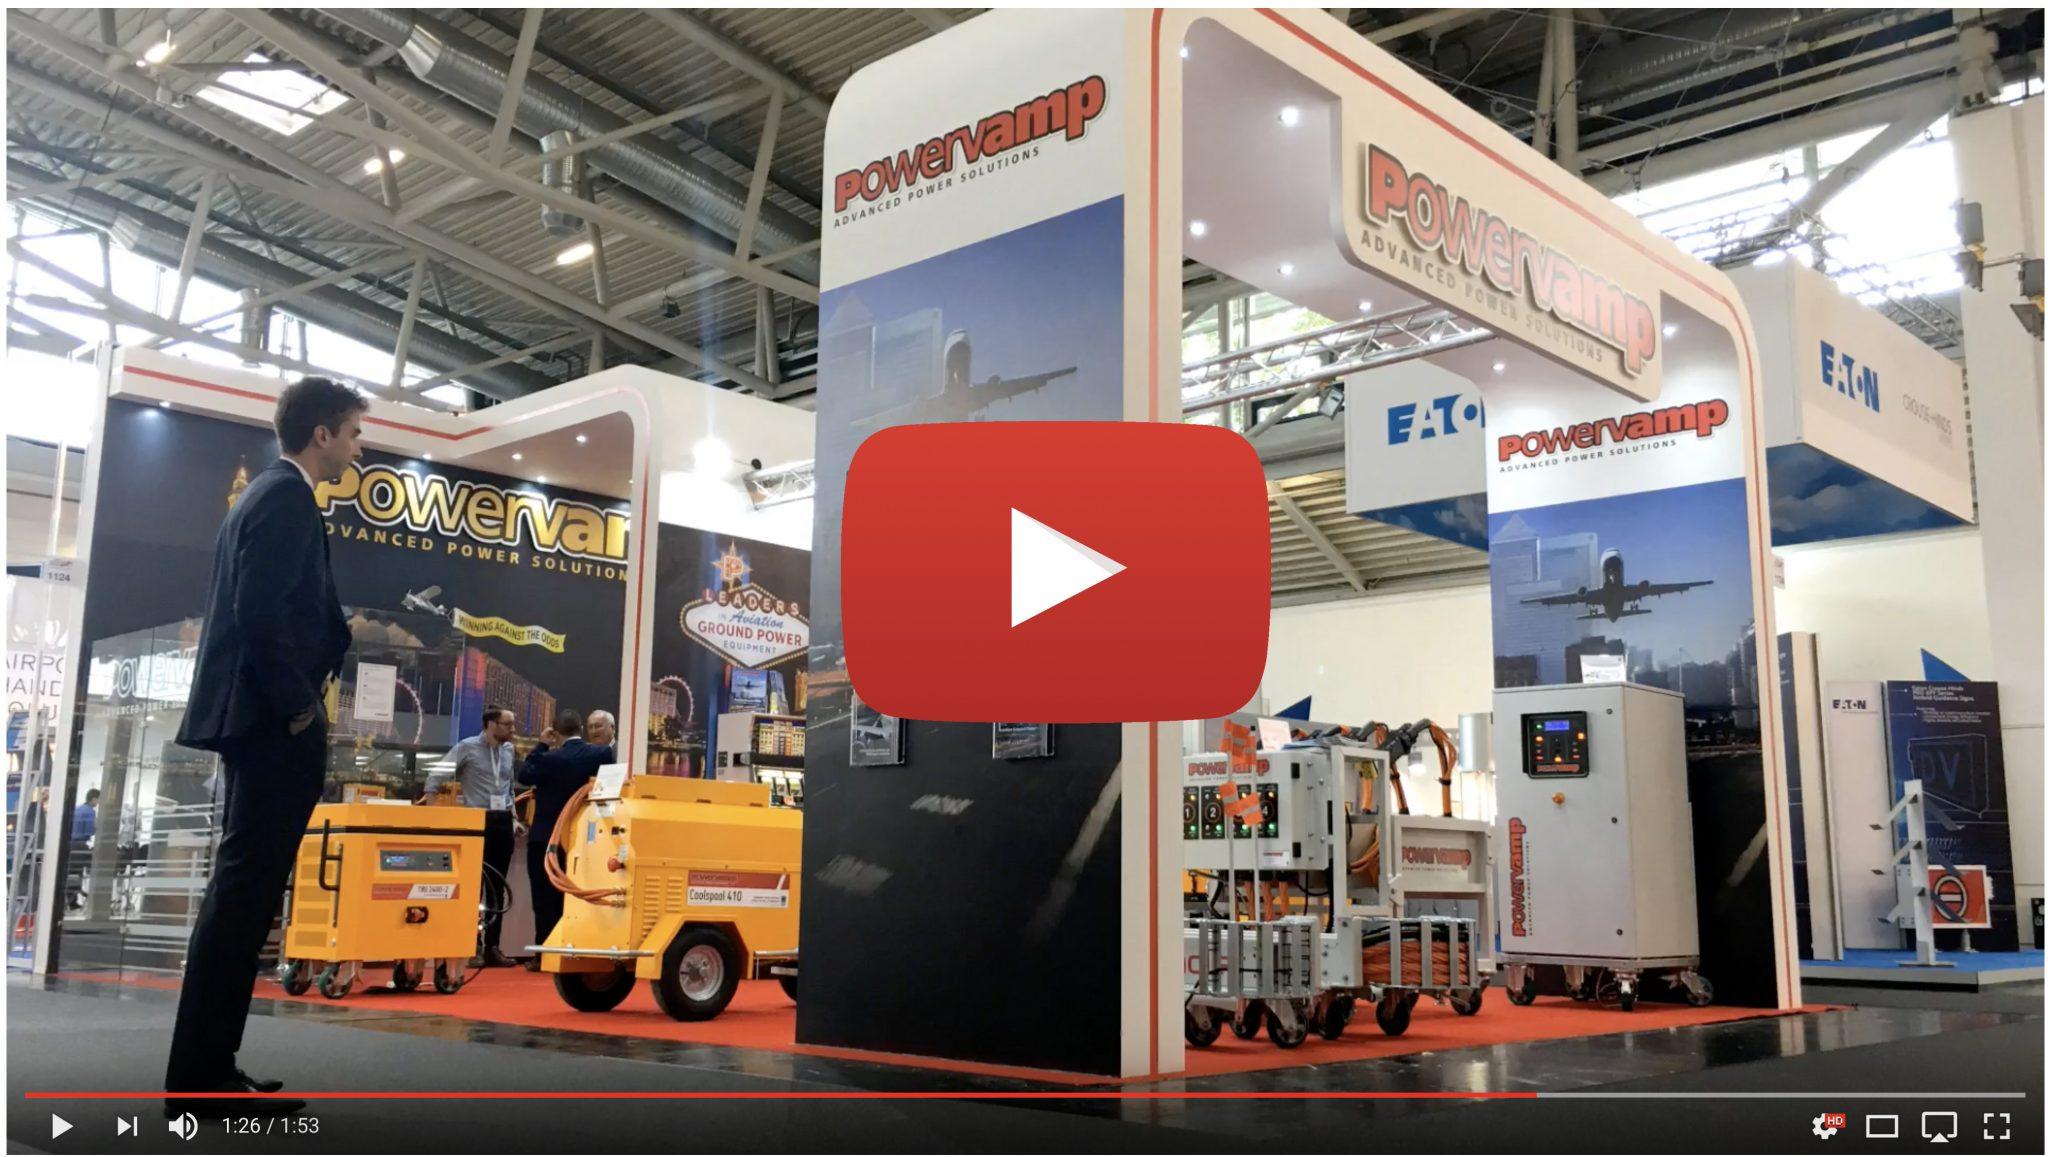 Powervamp video thumbnail